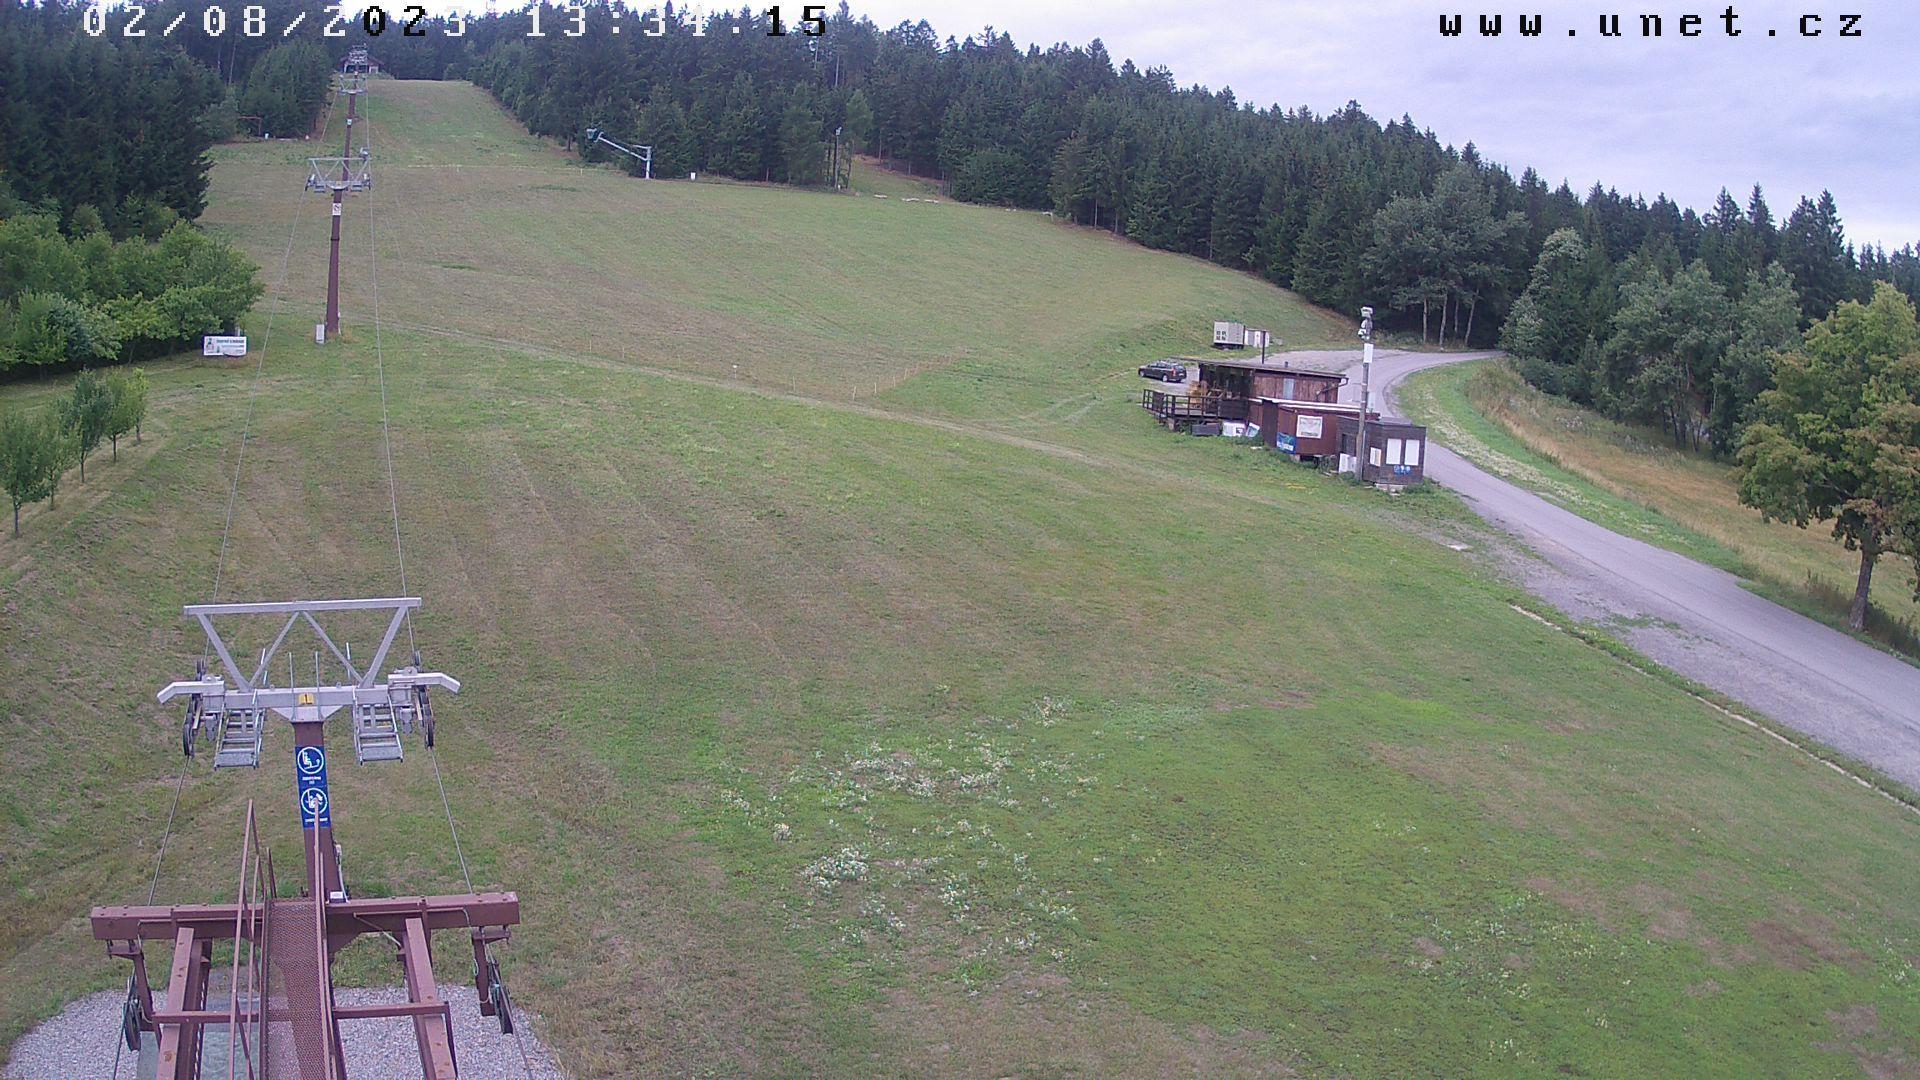 Webcam Harusův kopec I